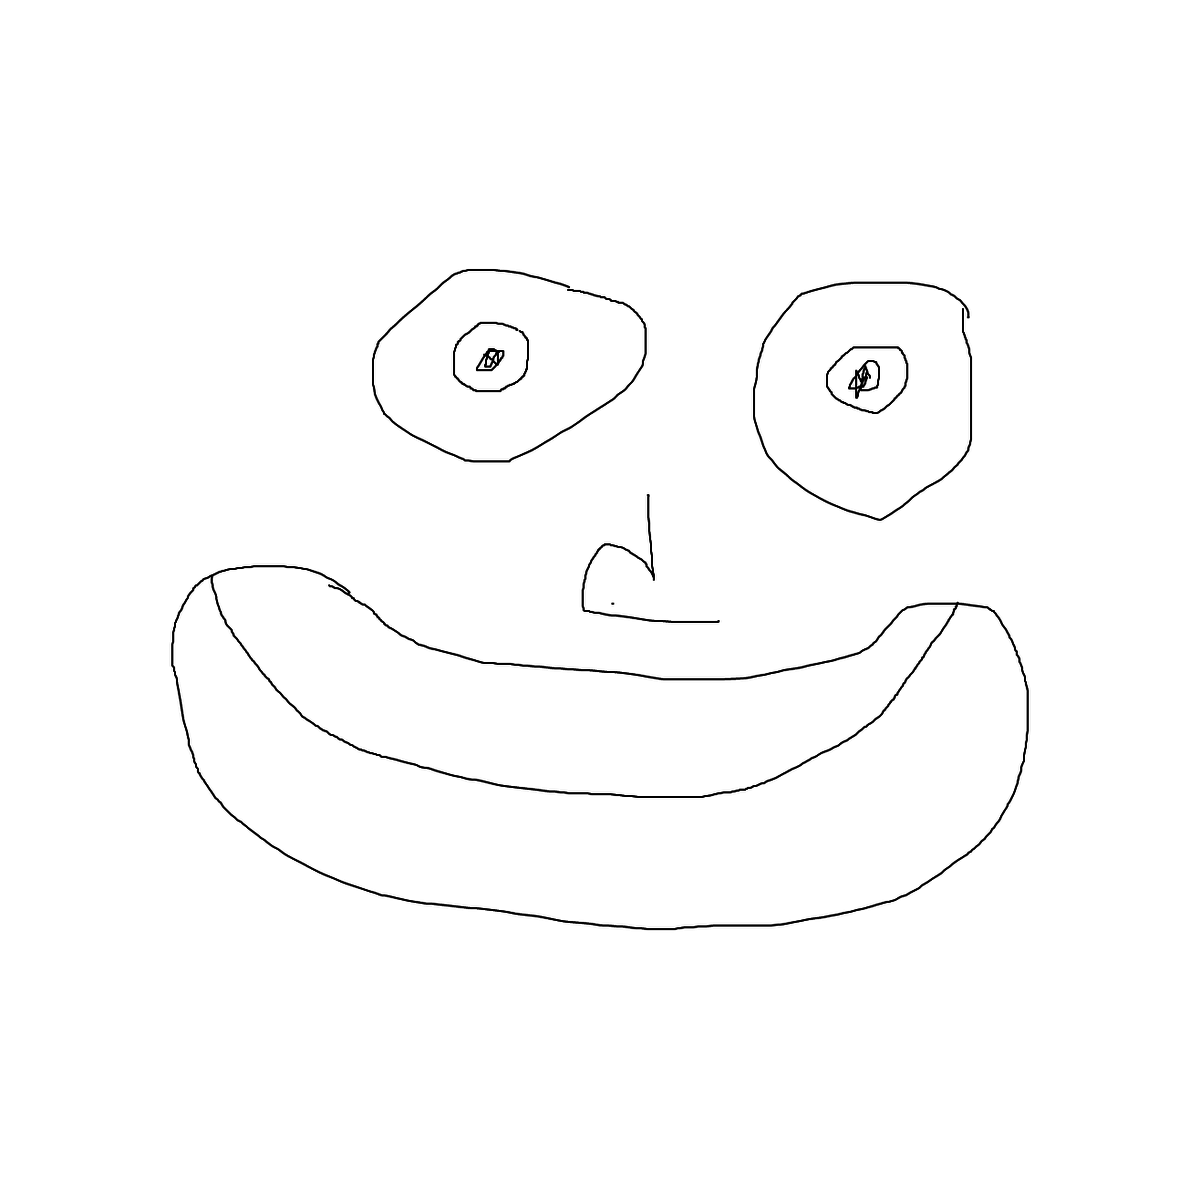 BAAAM drawing#16924 lat:40.4021987915039060lng: -73.9919128417968800